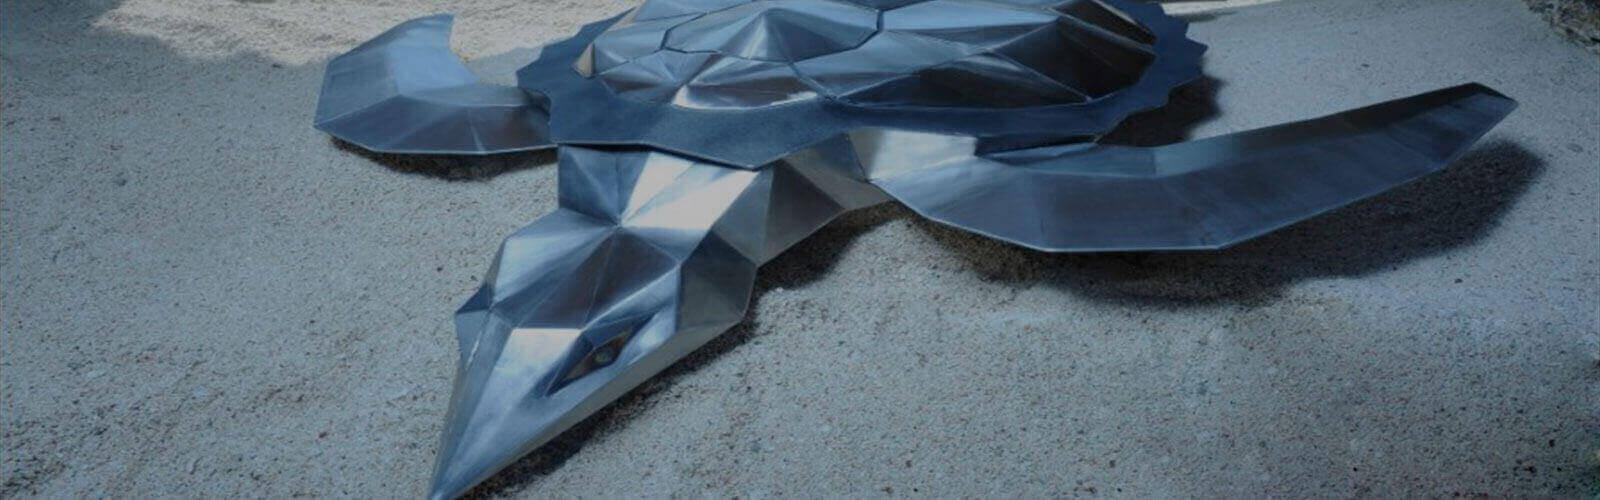 sitemap of artisan metal works cayman